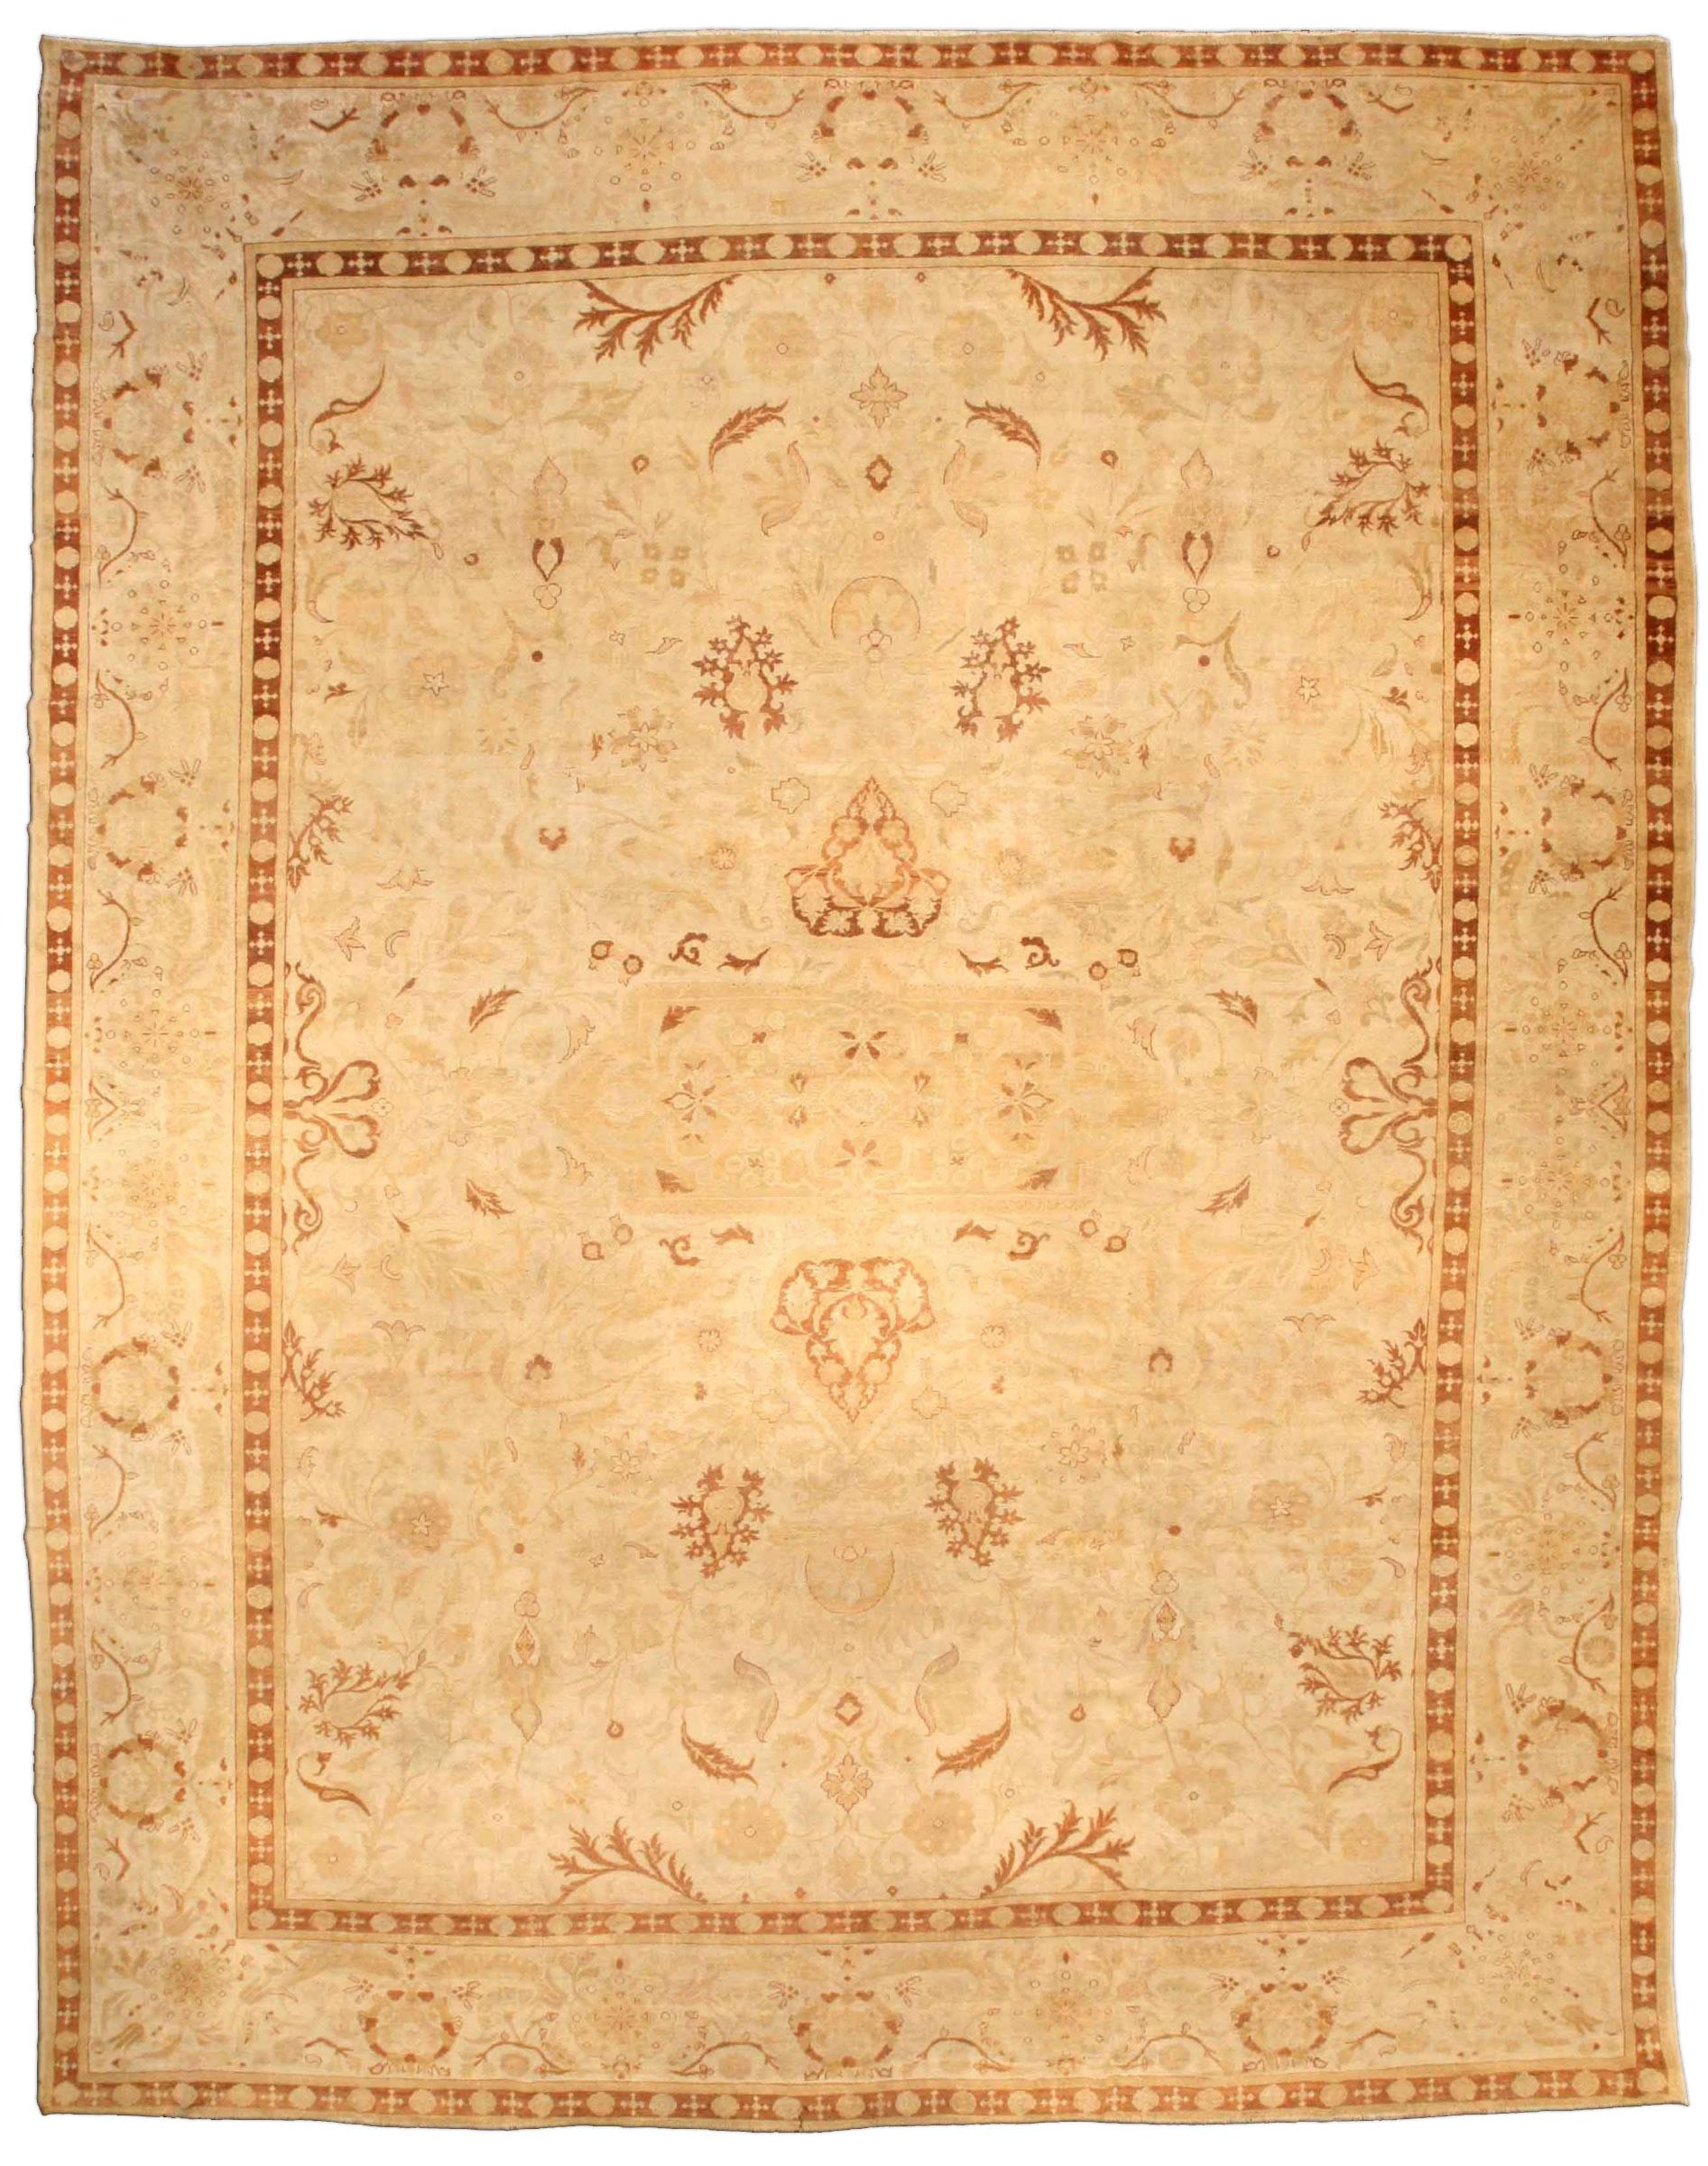 Antique Indian Amritsar Rug BB3677